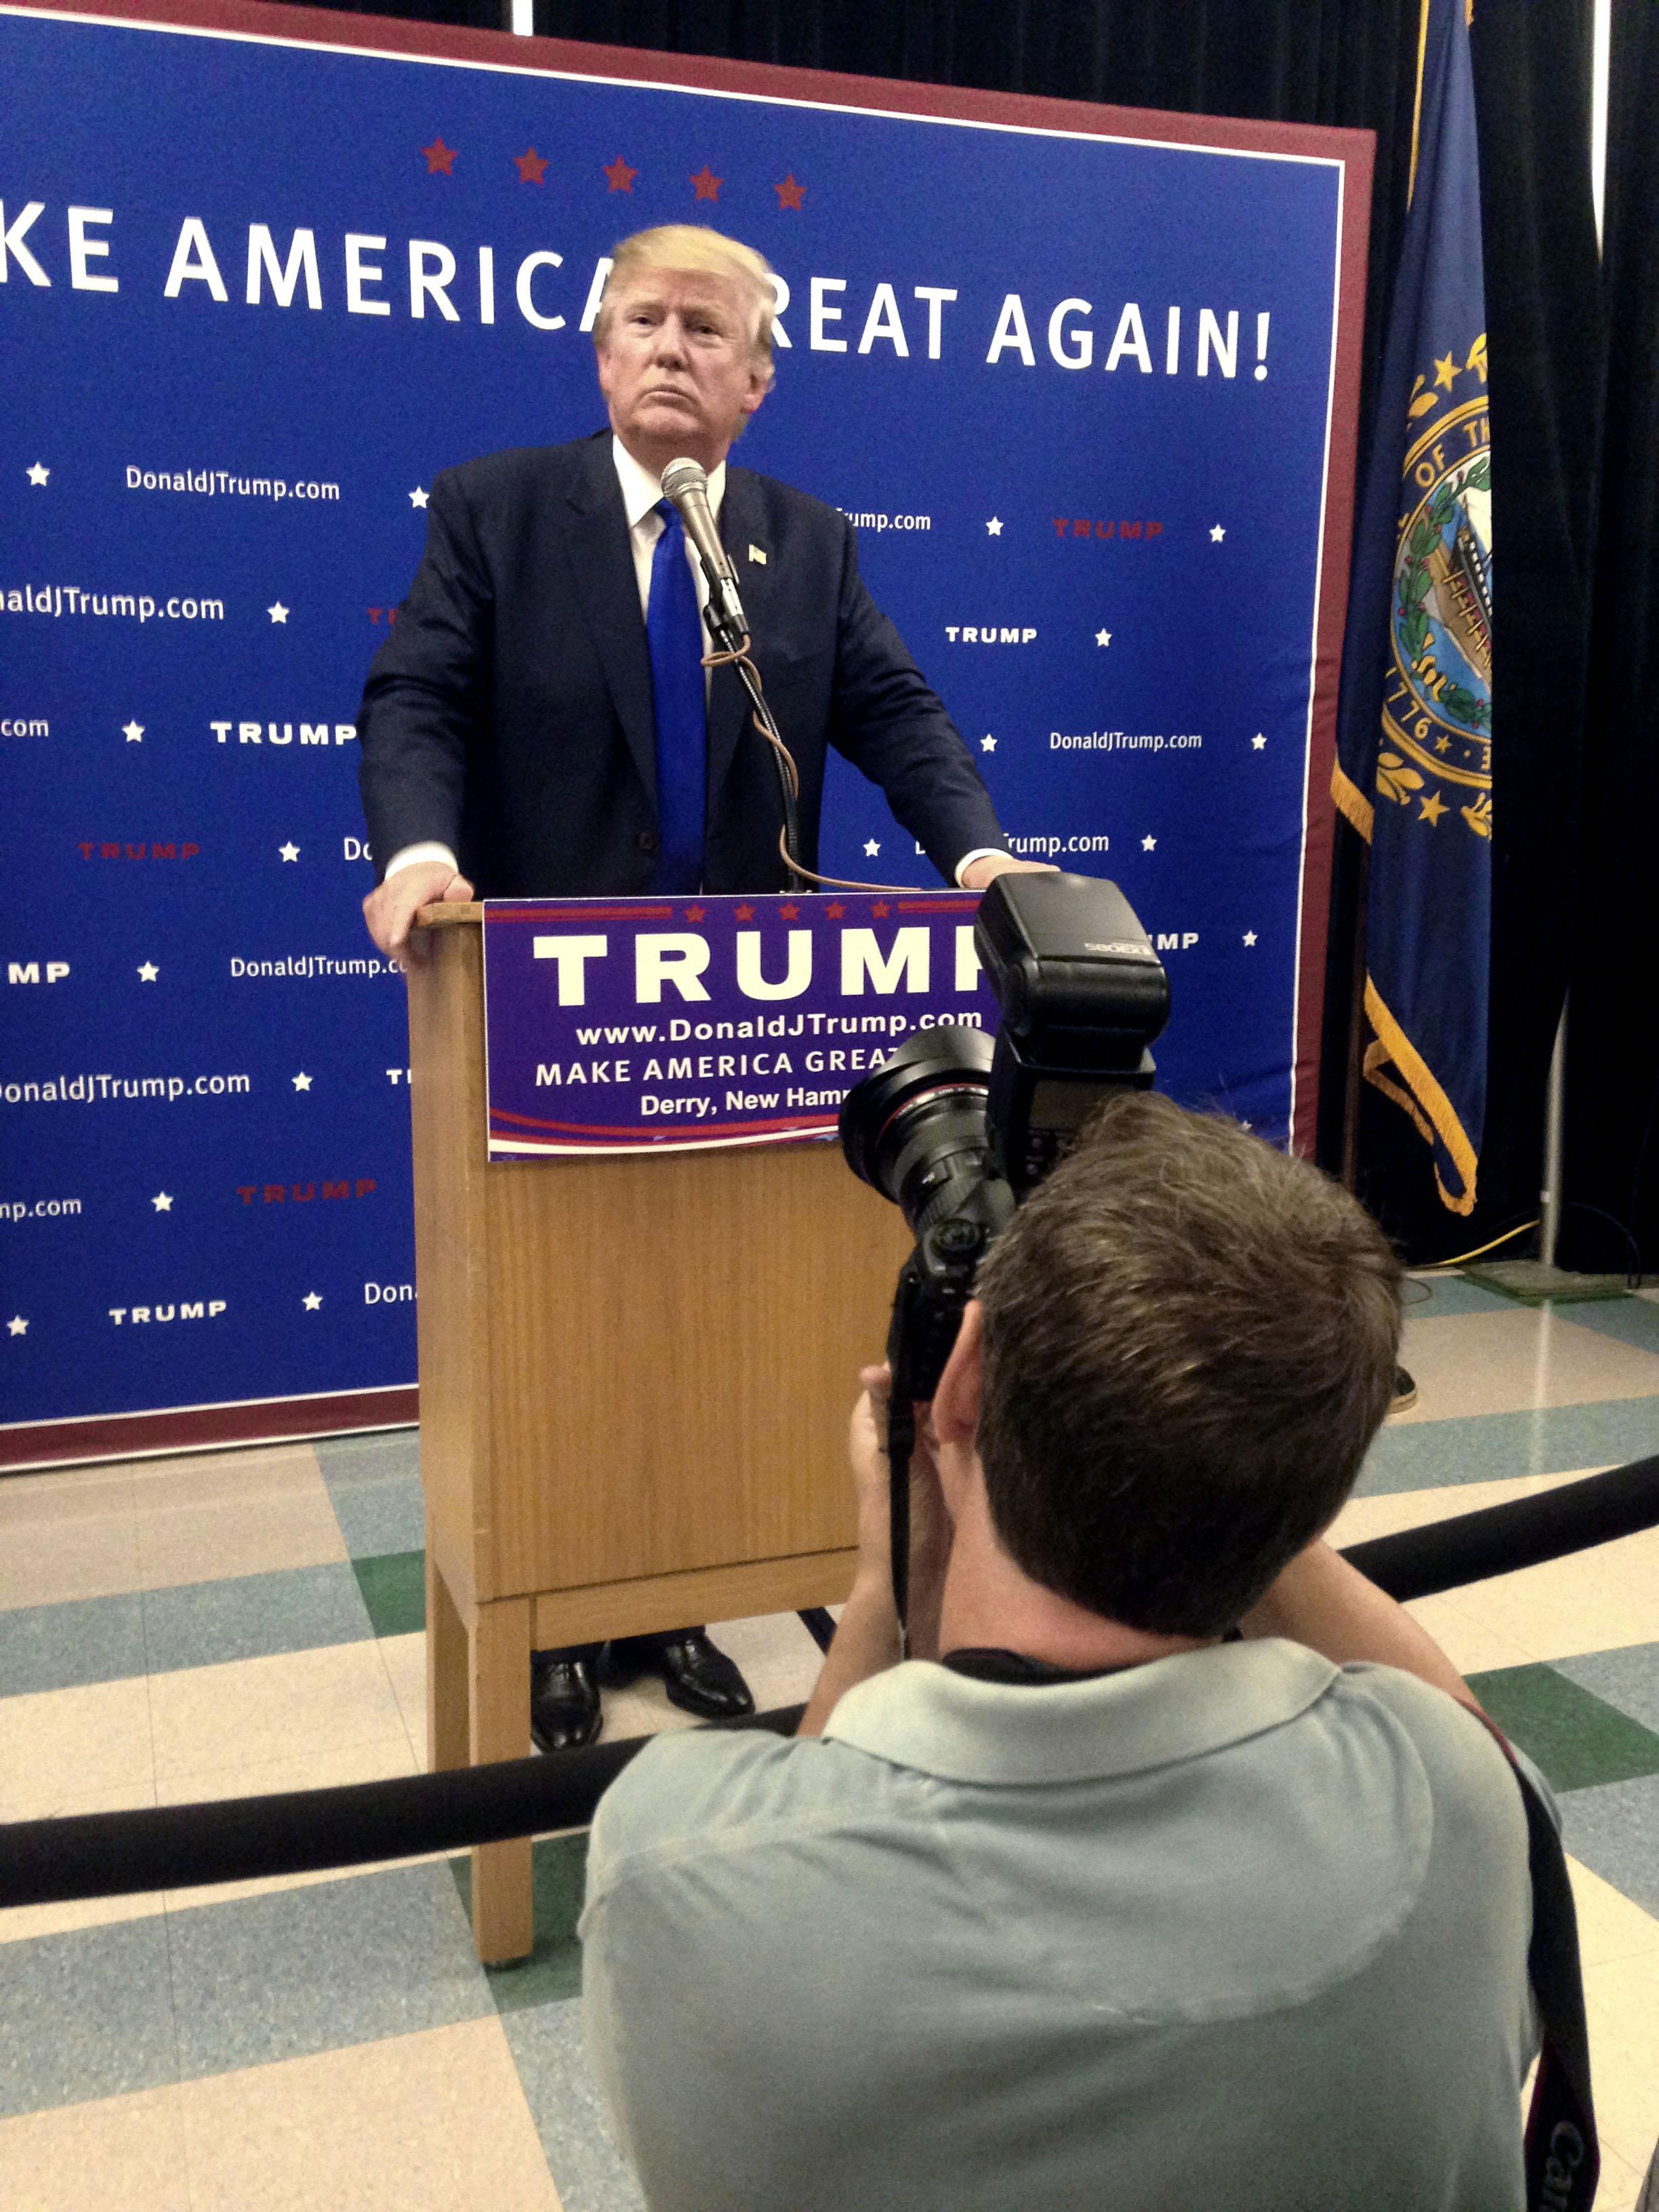 August, 2015: Jag fotograferar Donald Trump under ett valmöte i  Derry, New Hampshire. Foto: Marianne Vikås